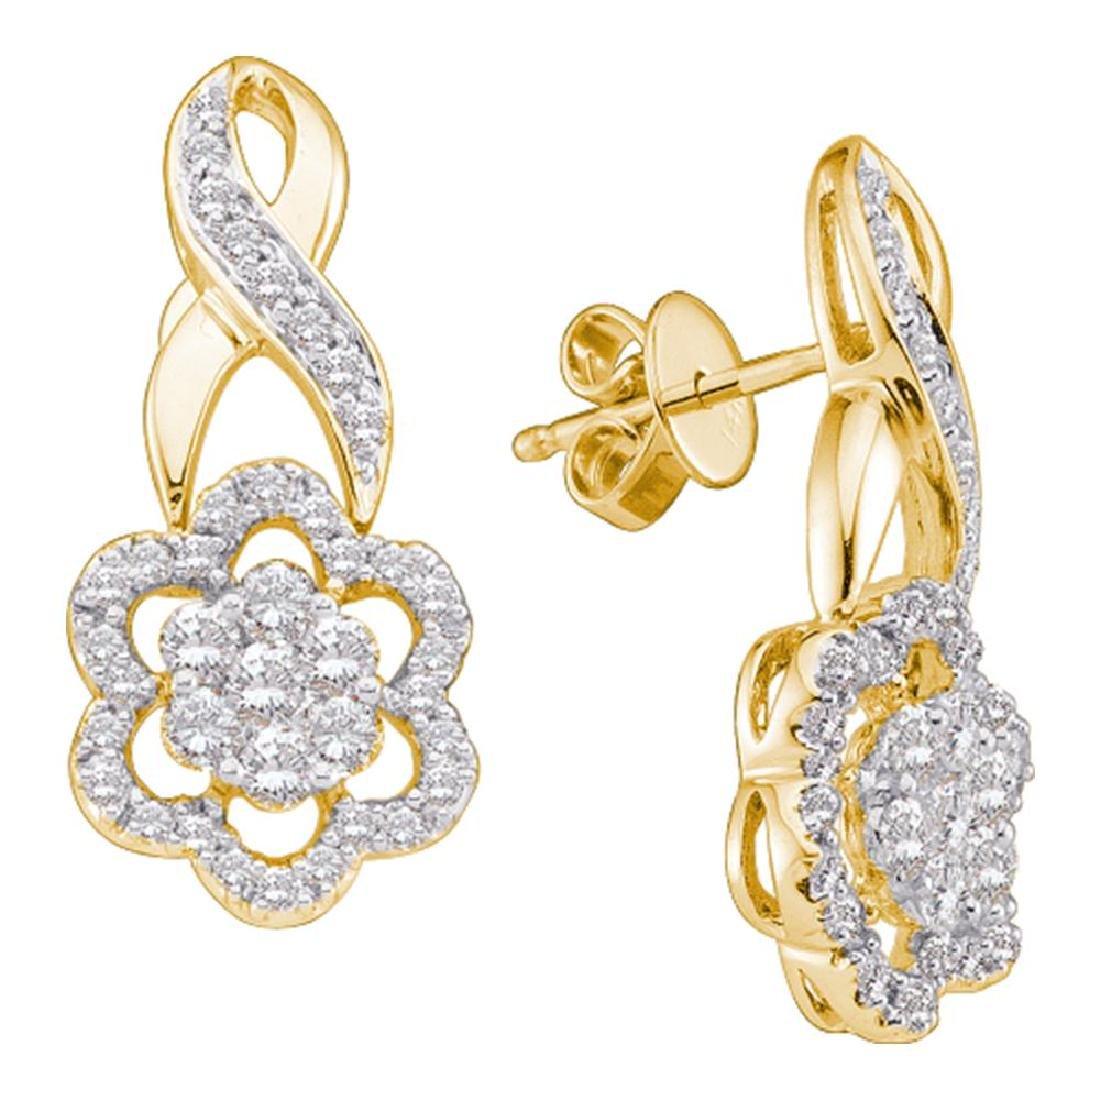 0.99 CTW Diamond Flower Screwback Earrings 14KT Yellow